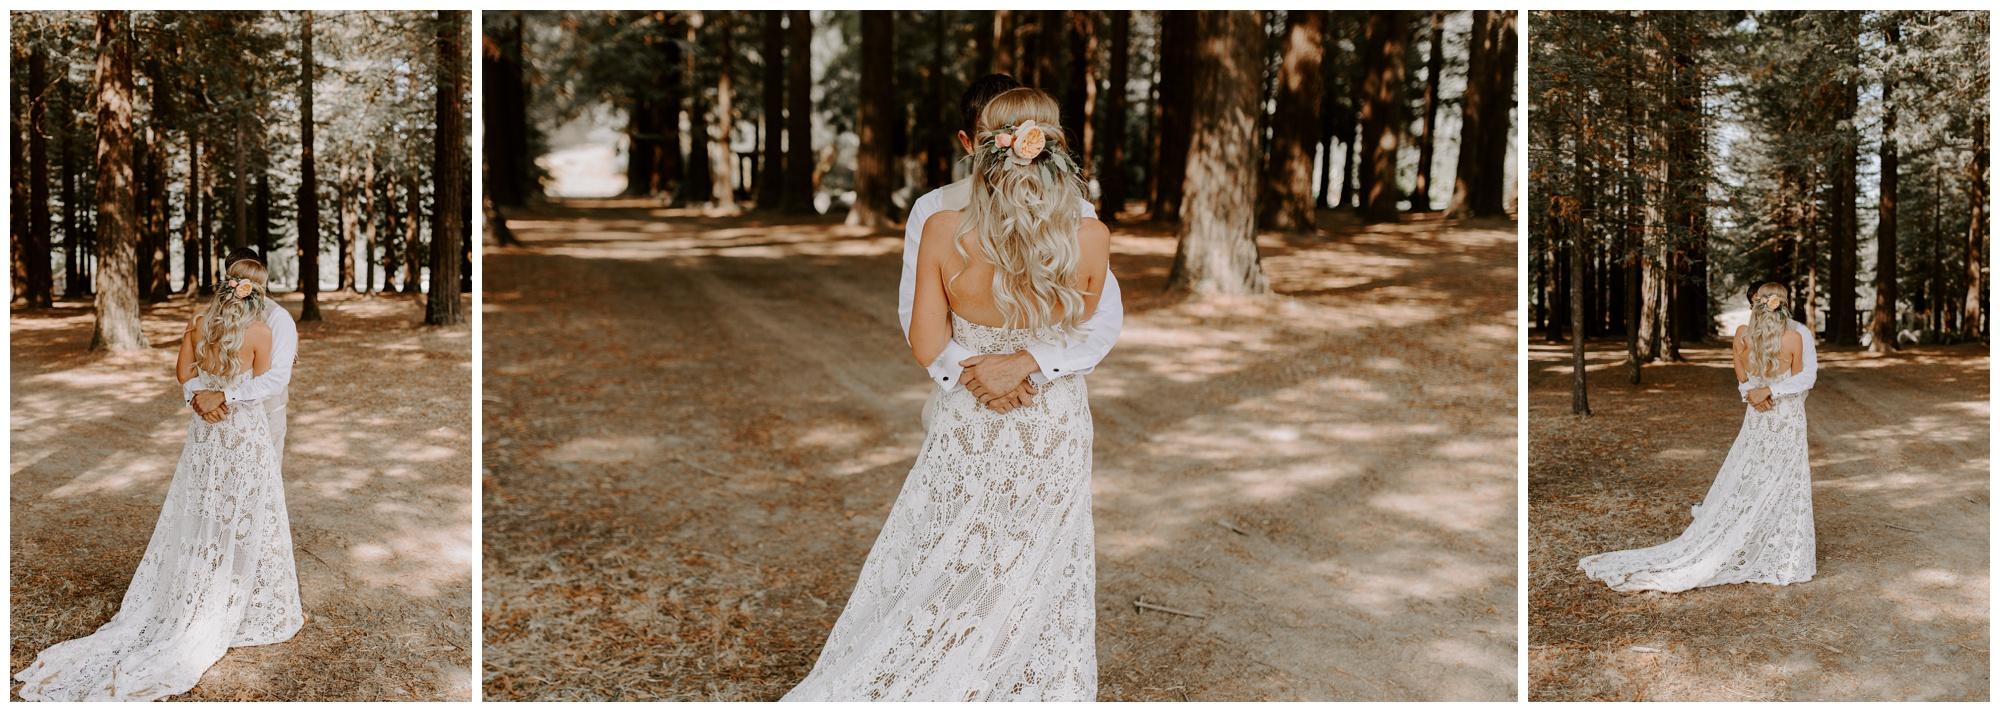 Redwood Festival Wedding Humbolt California - Jessica Heron Images_0011.jpg